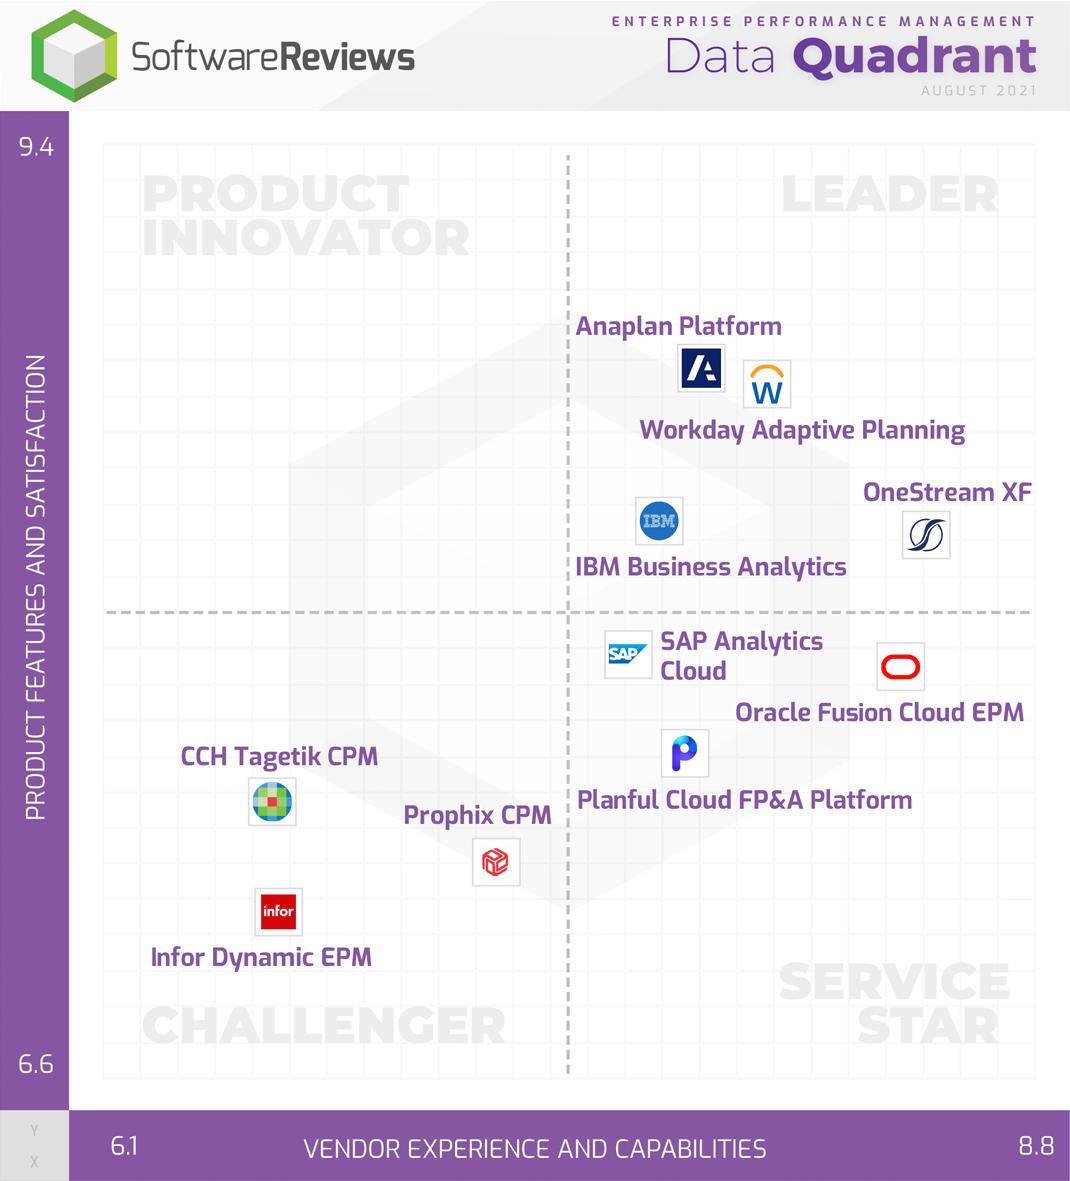 Enterprise Performance Management Data Quadrant